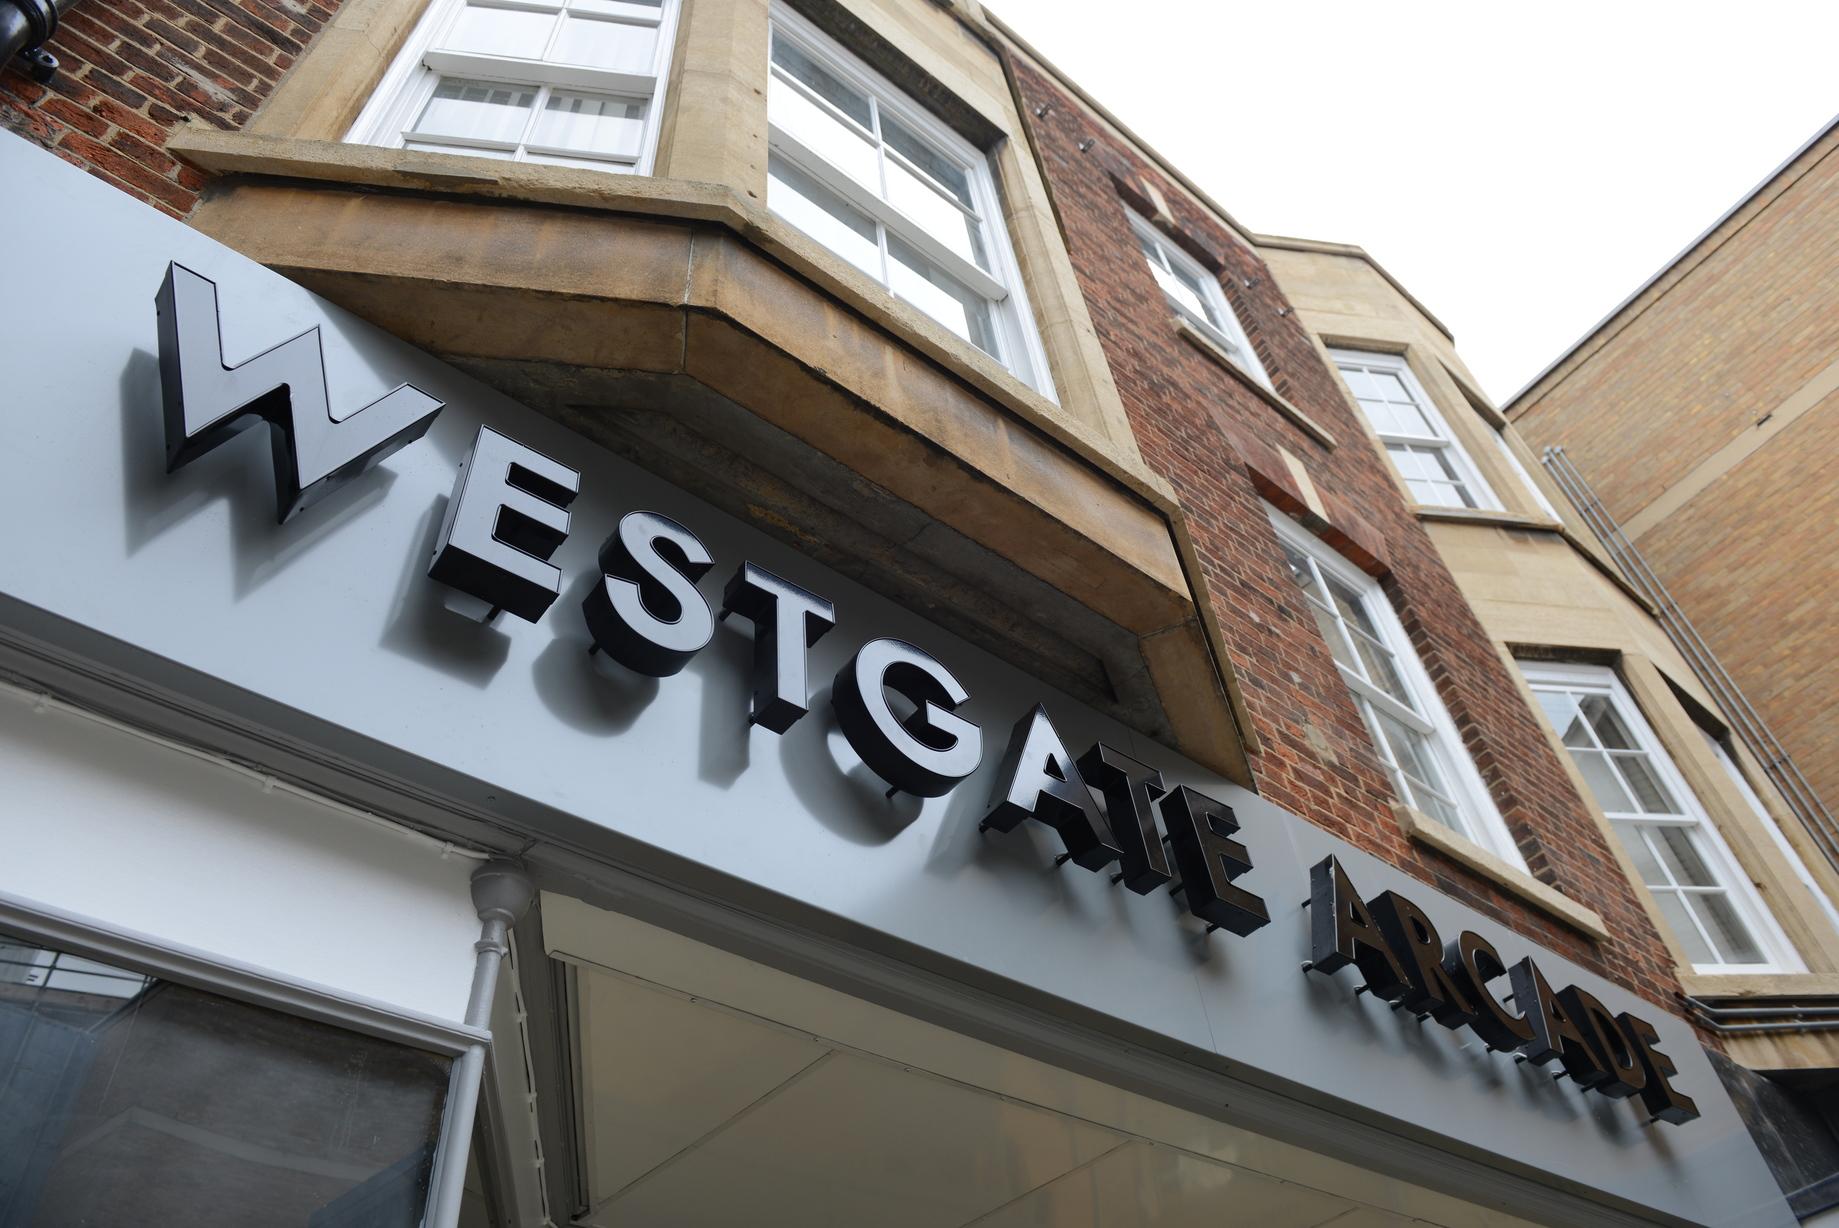 Westgate Arcade Refurbishment